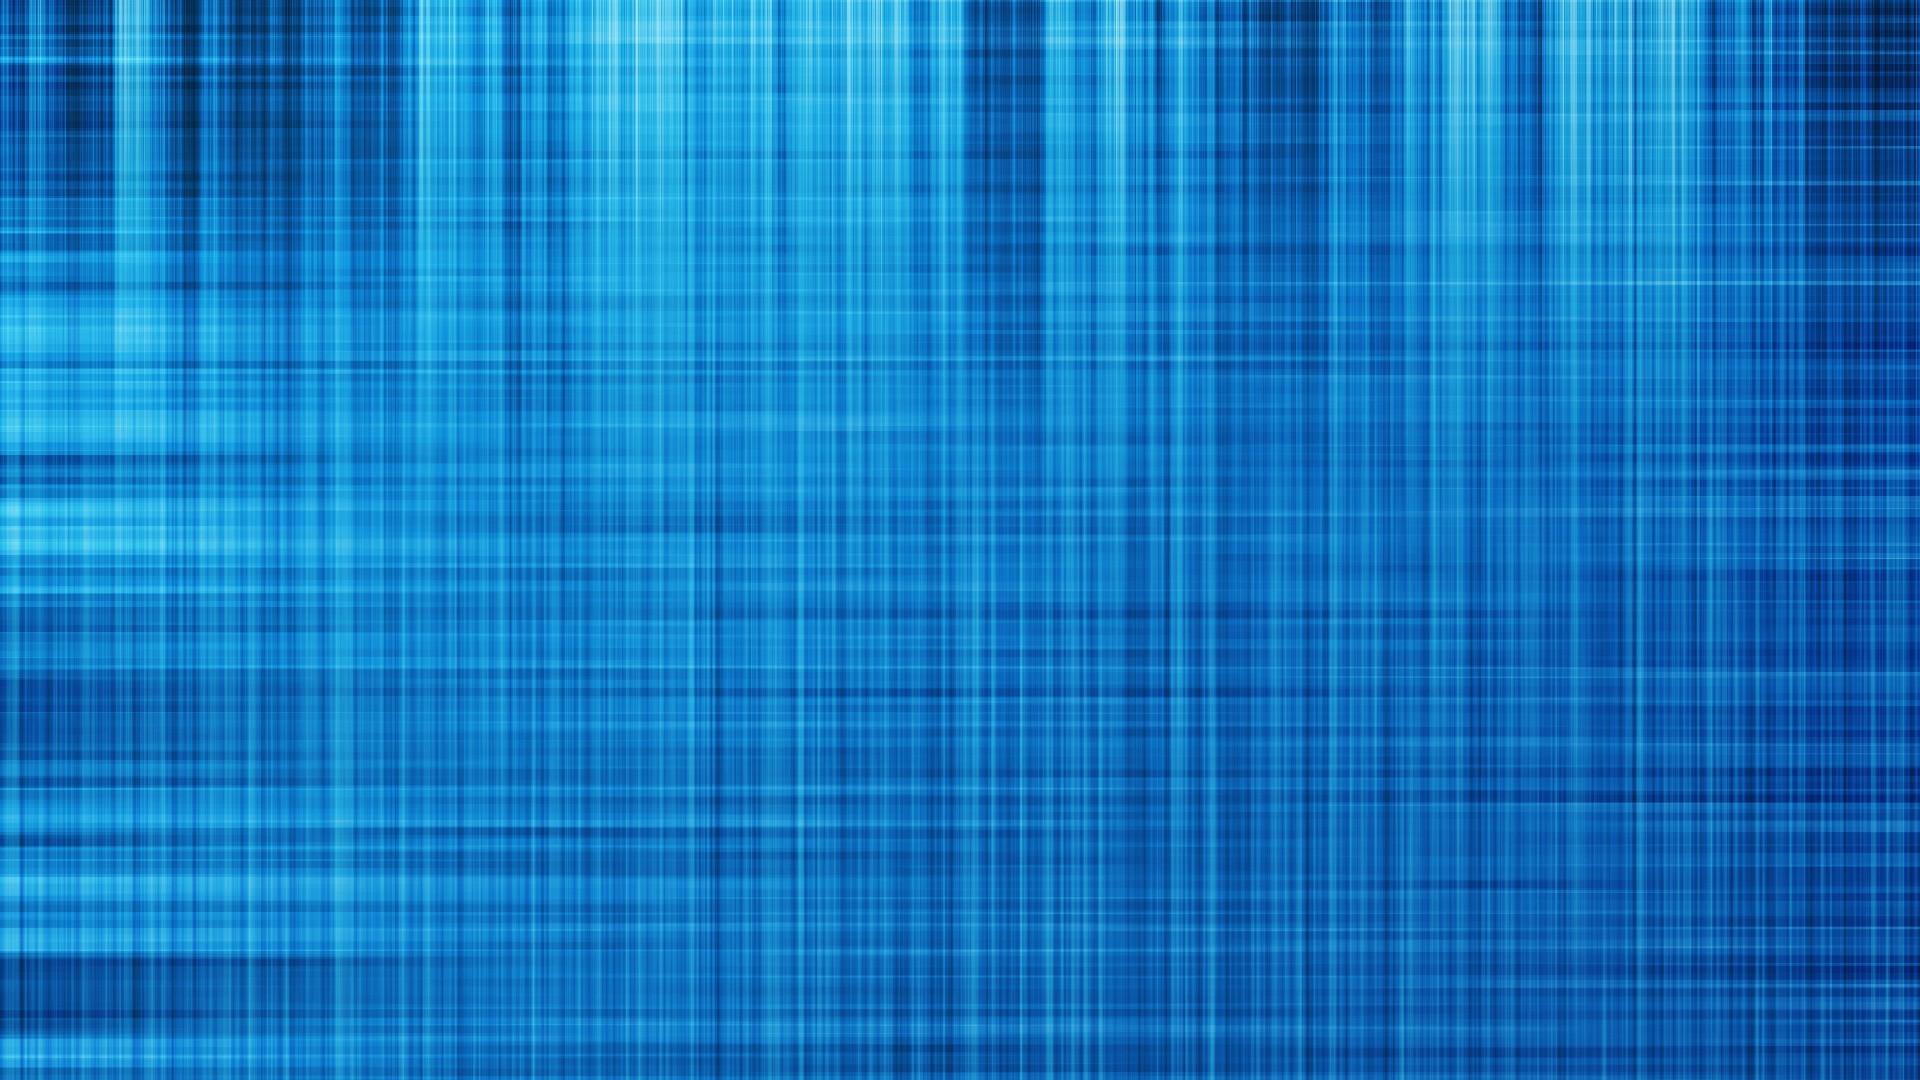 Blue Textures Wallpaper Blue, Textures